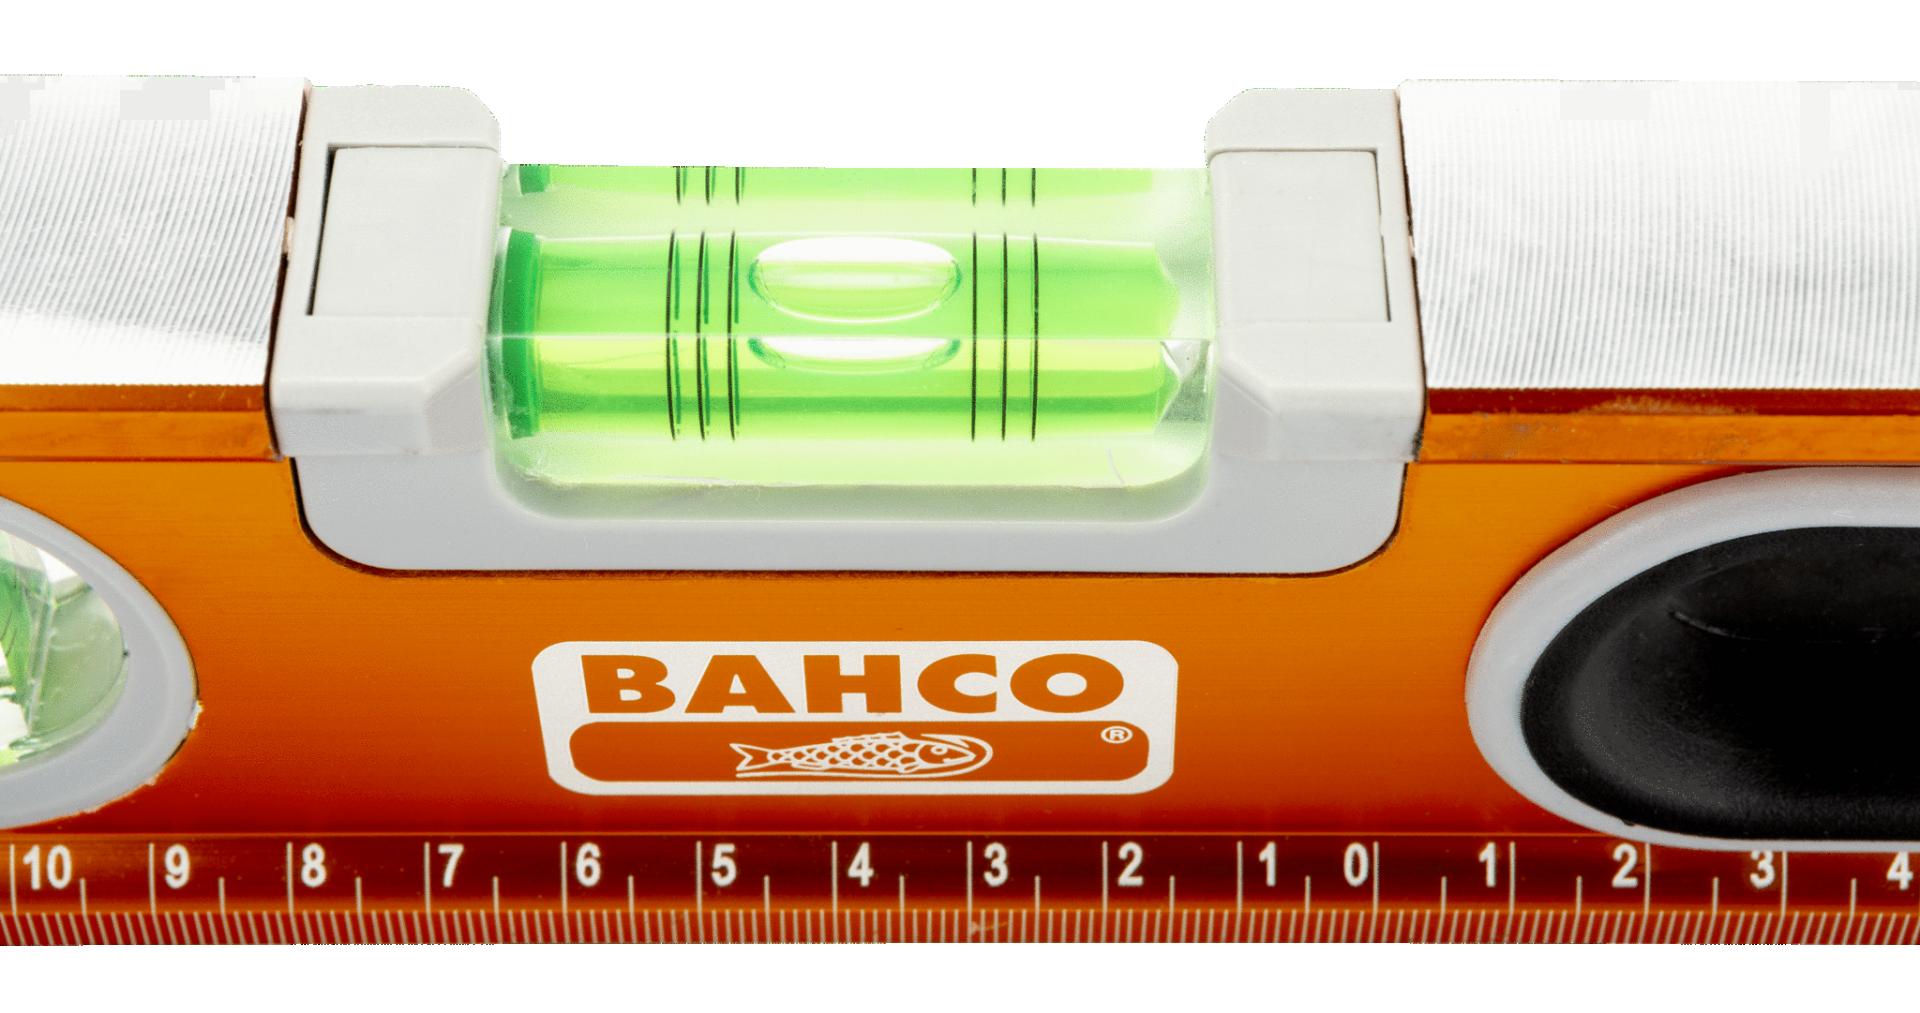 Poziomica 600 mm aluminiowa, anodowana Bahco (nr kat. 466-600)